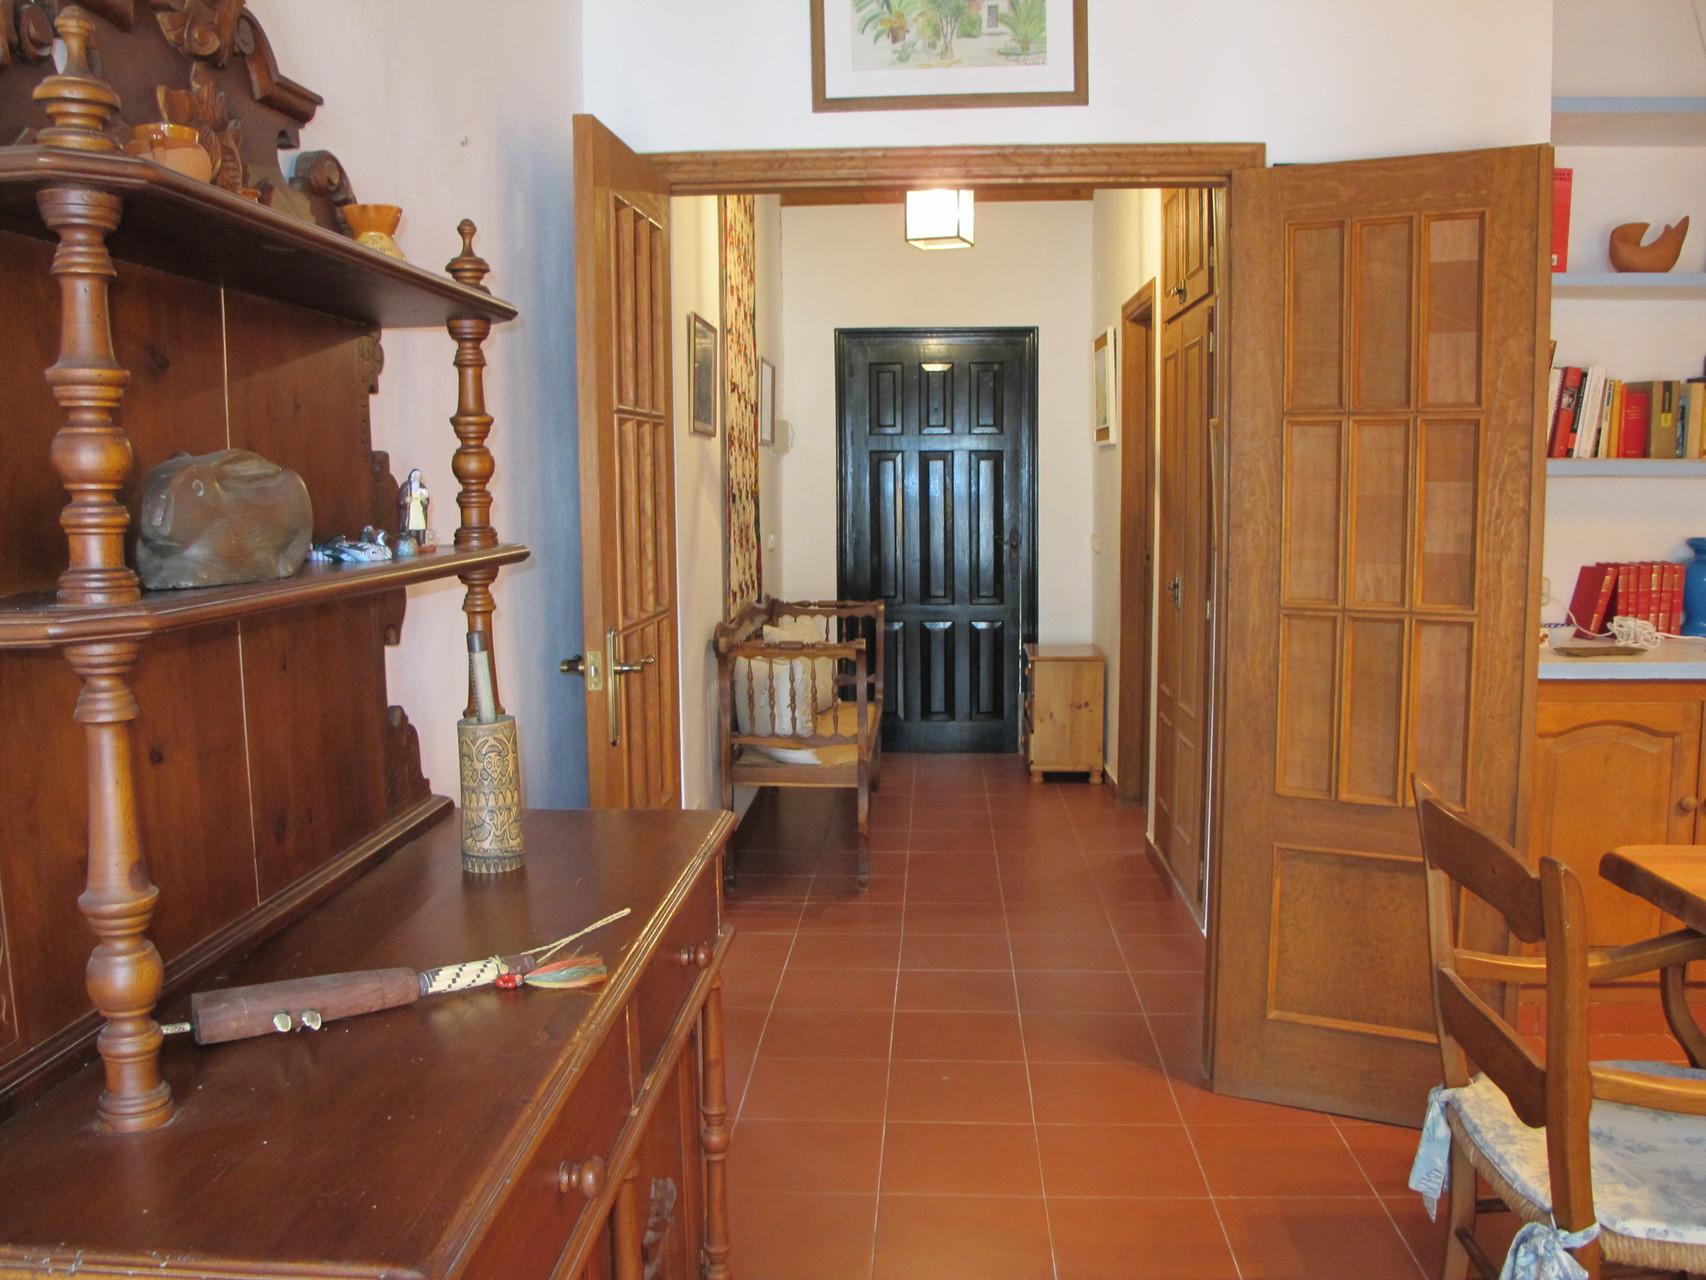 Detalle Villa Greenfield, vista interior del recibidor